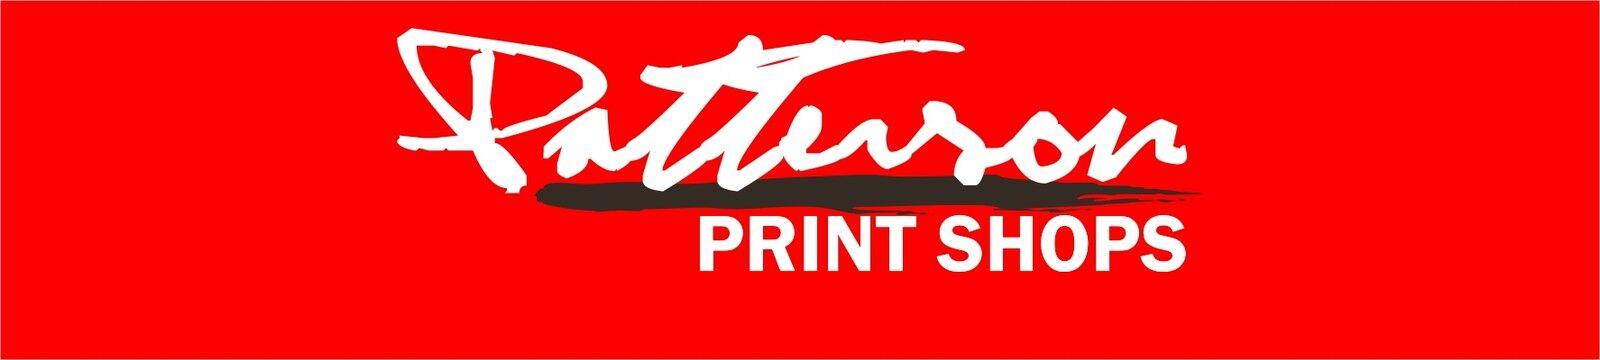 Patterson Print Shop